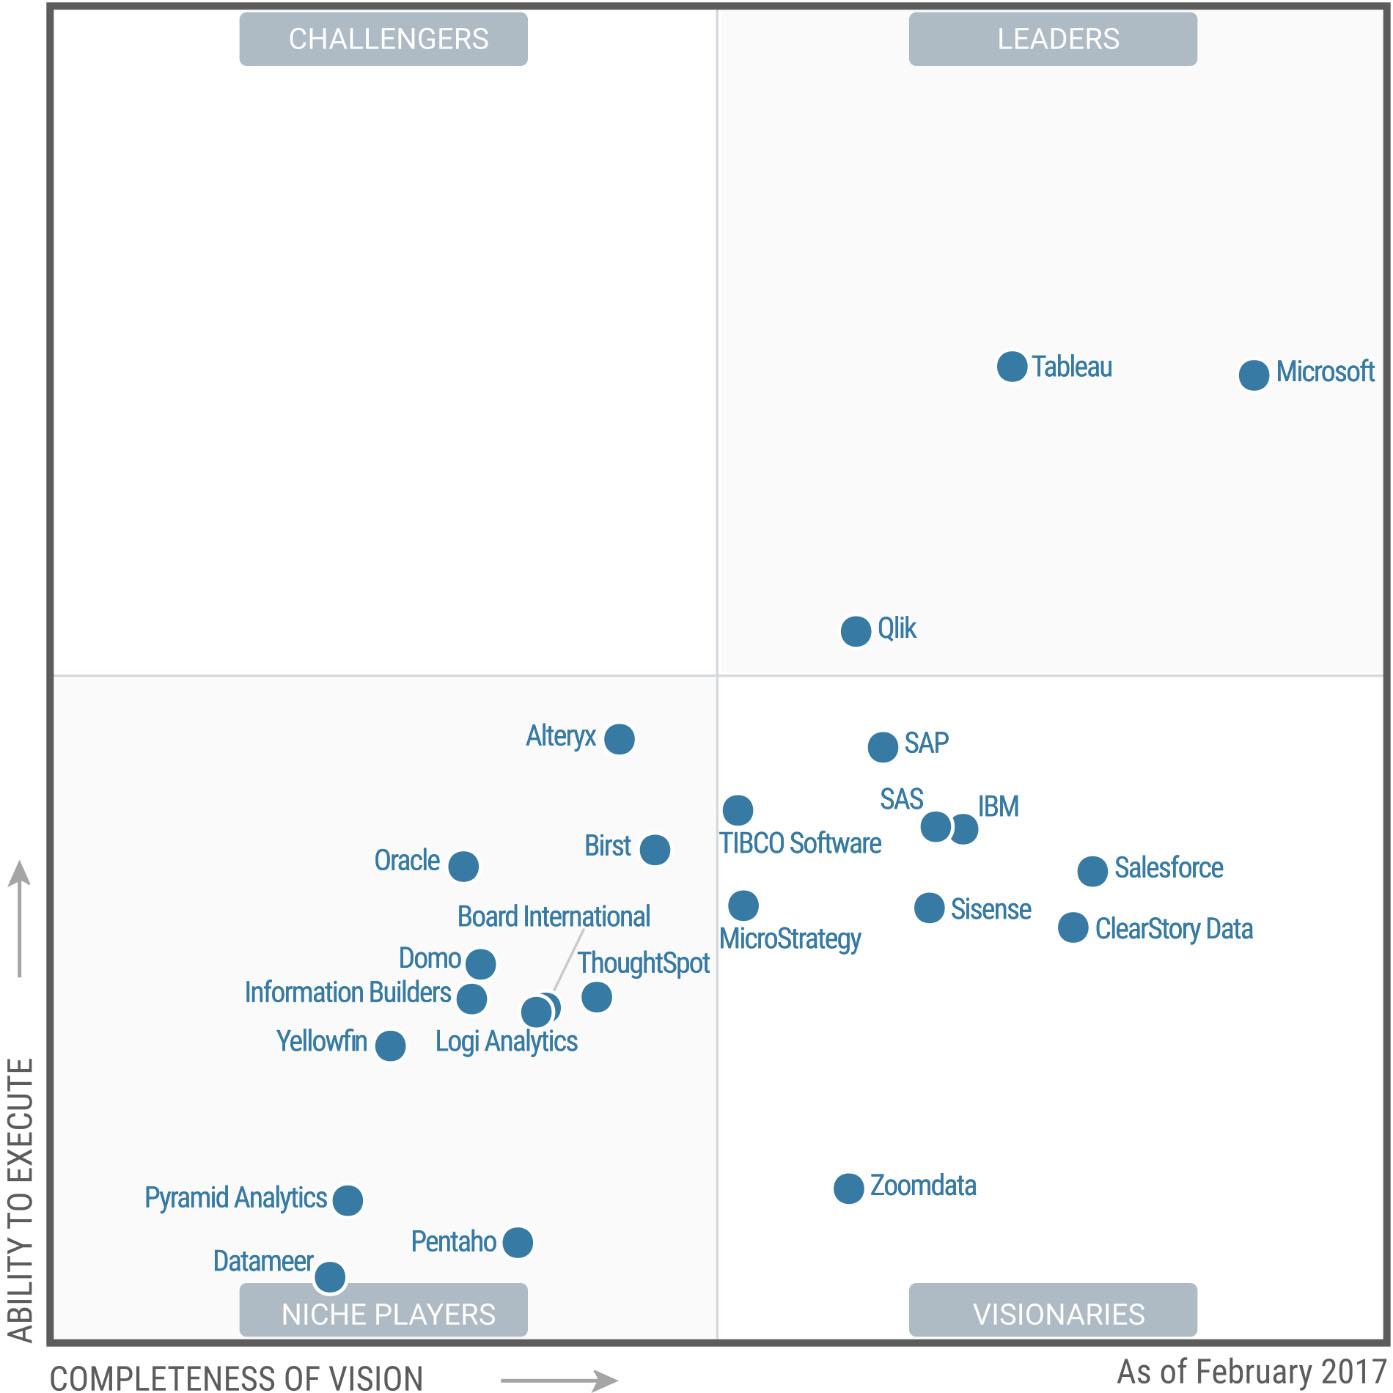 tableau leader magic quadrant gartner 2017